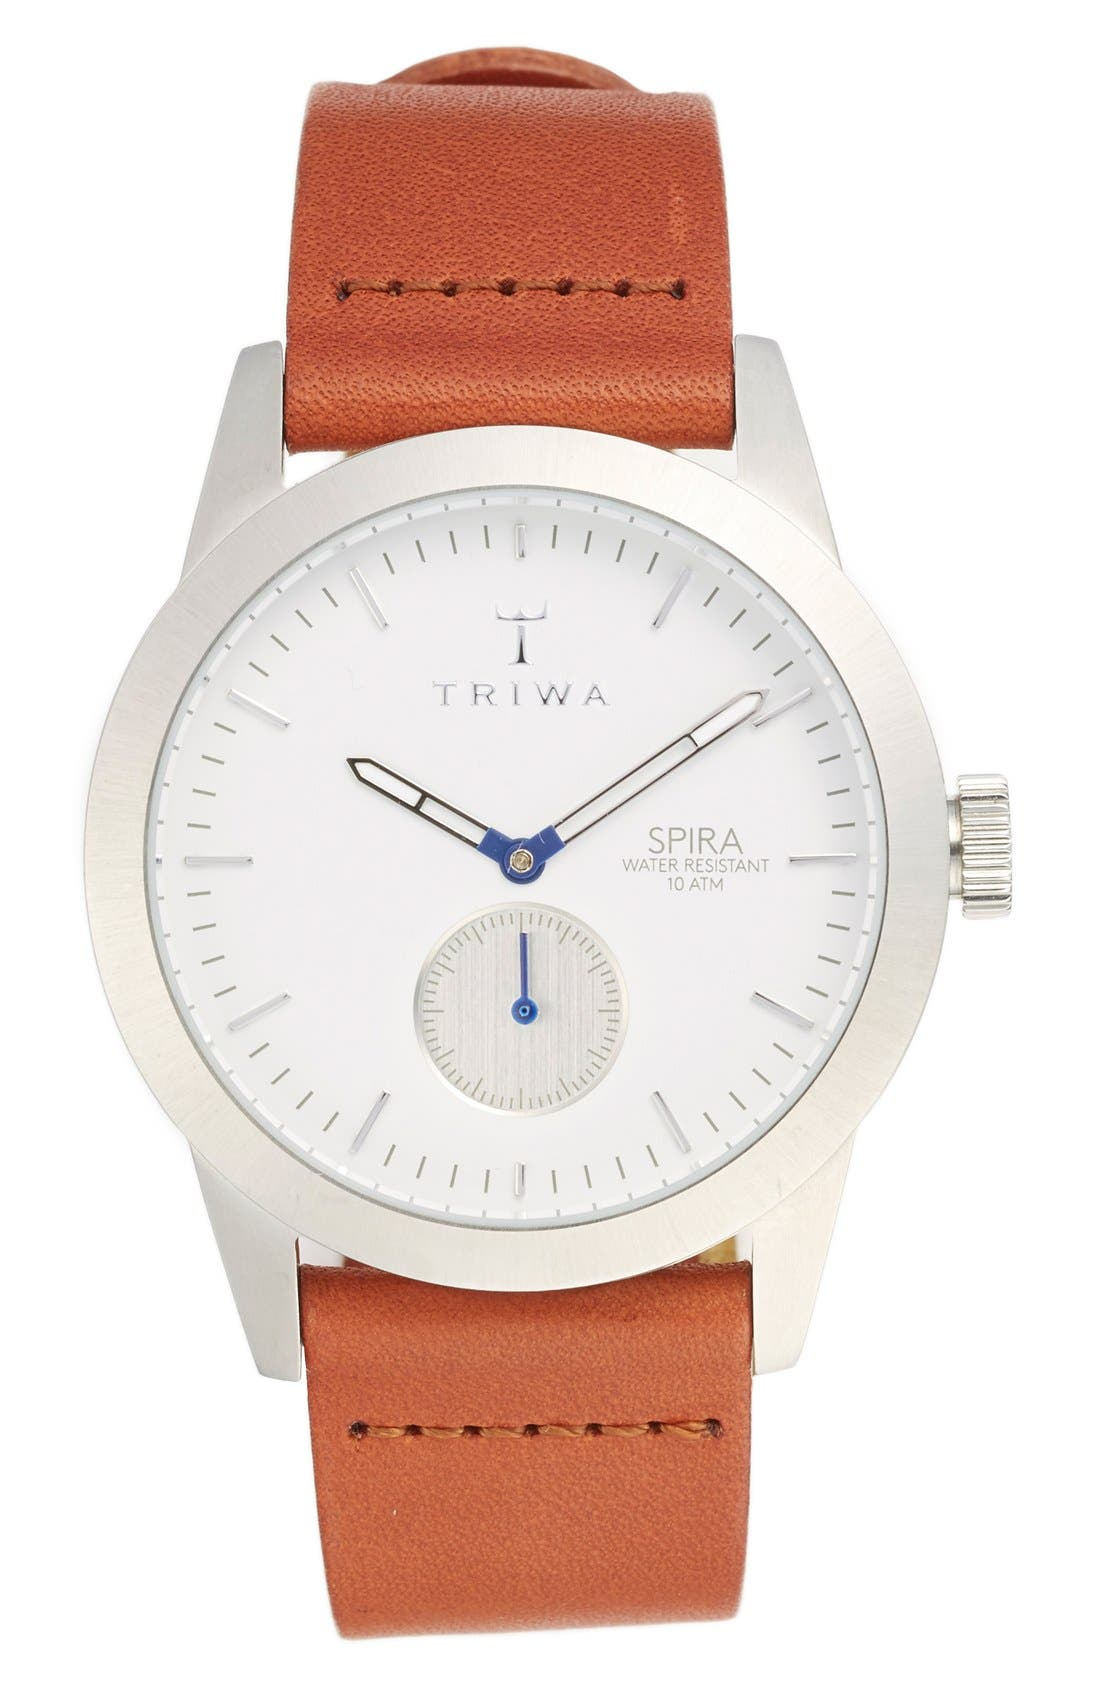 TRIWA Spira Leather Strap Watch, 38mm